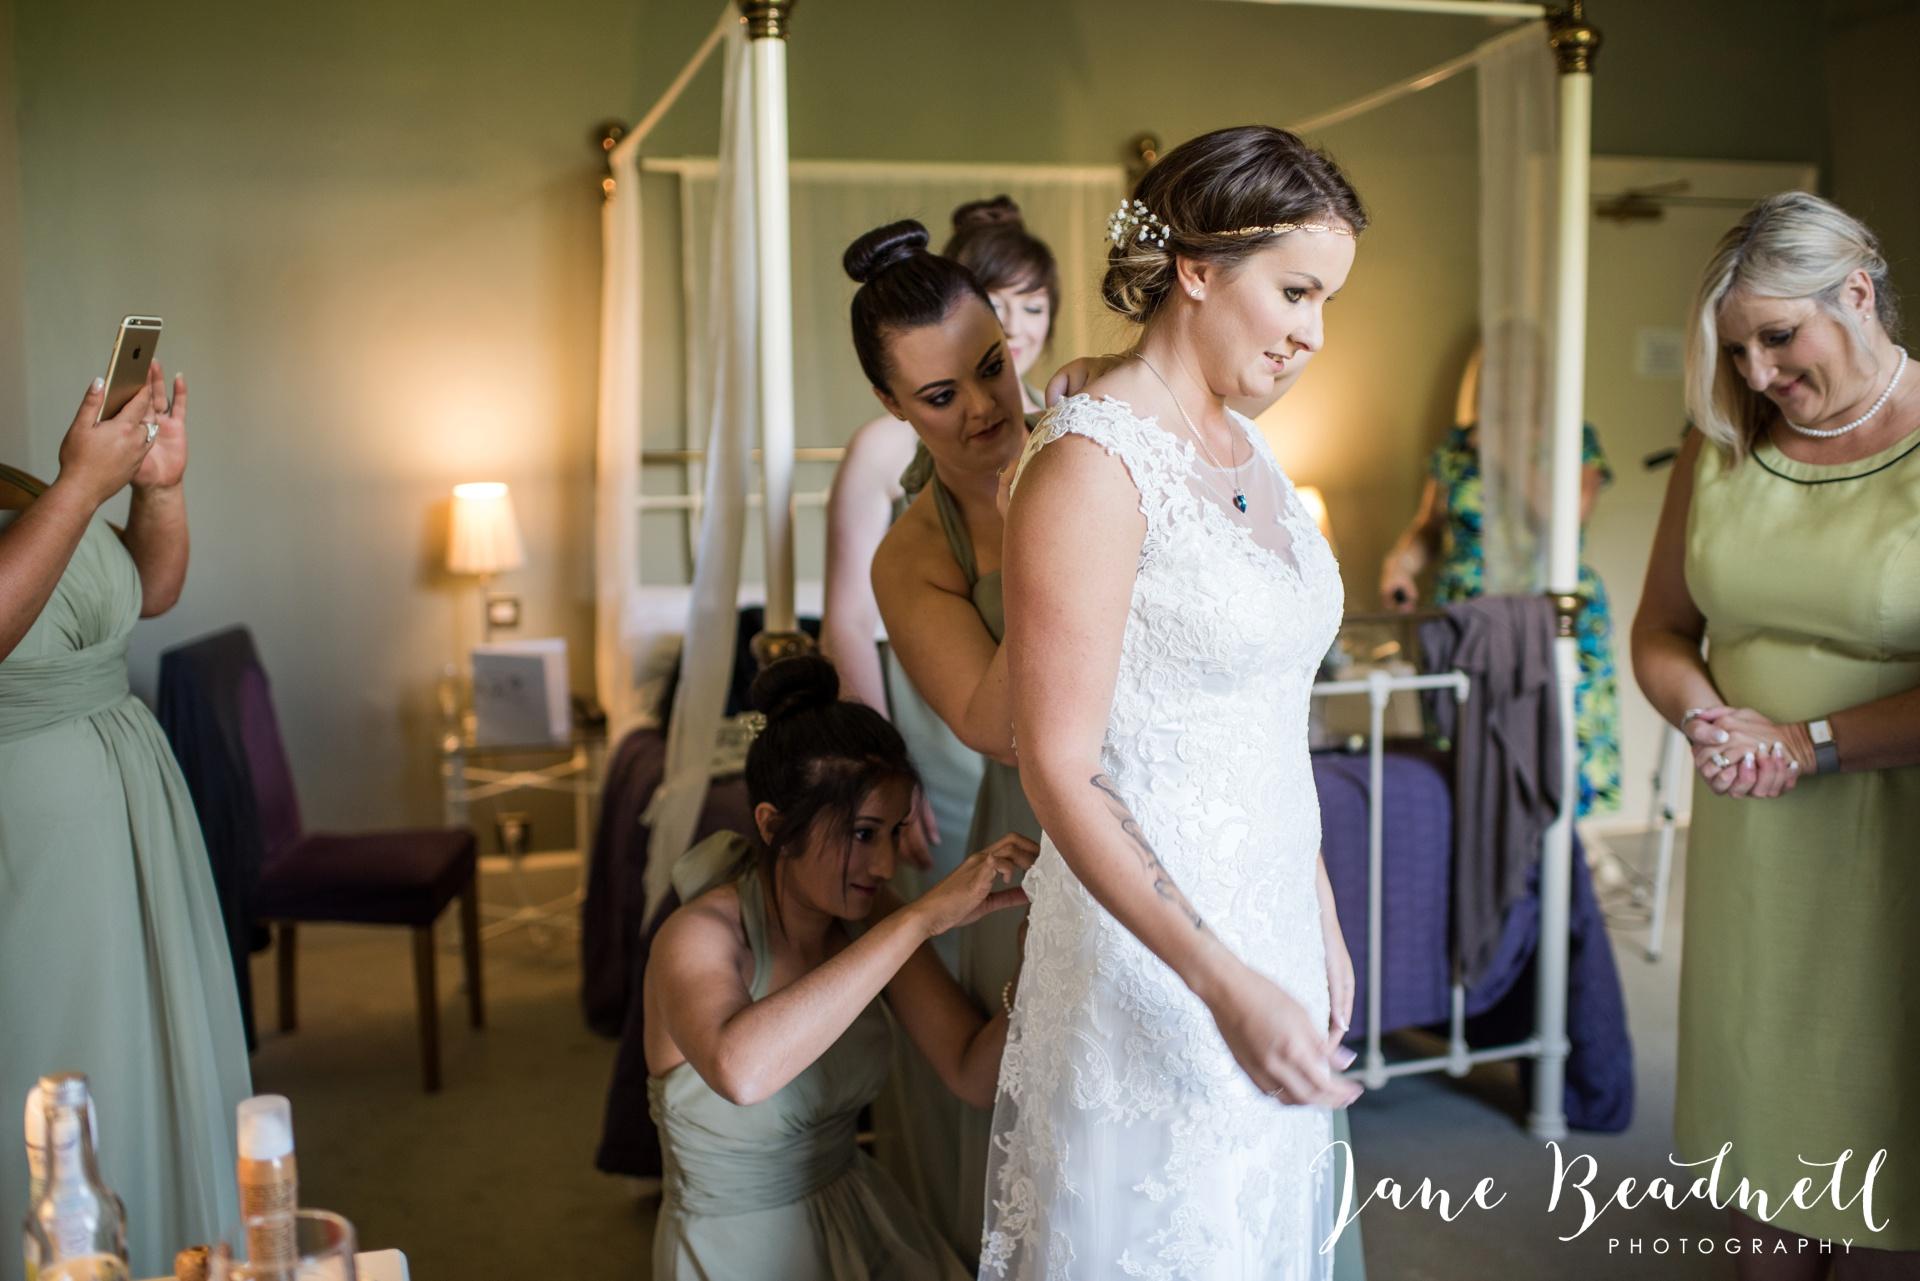 Jane Beadnell fine art wedding photographer The Old Deanery Ripon_0015